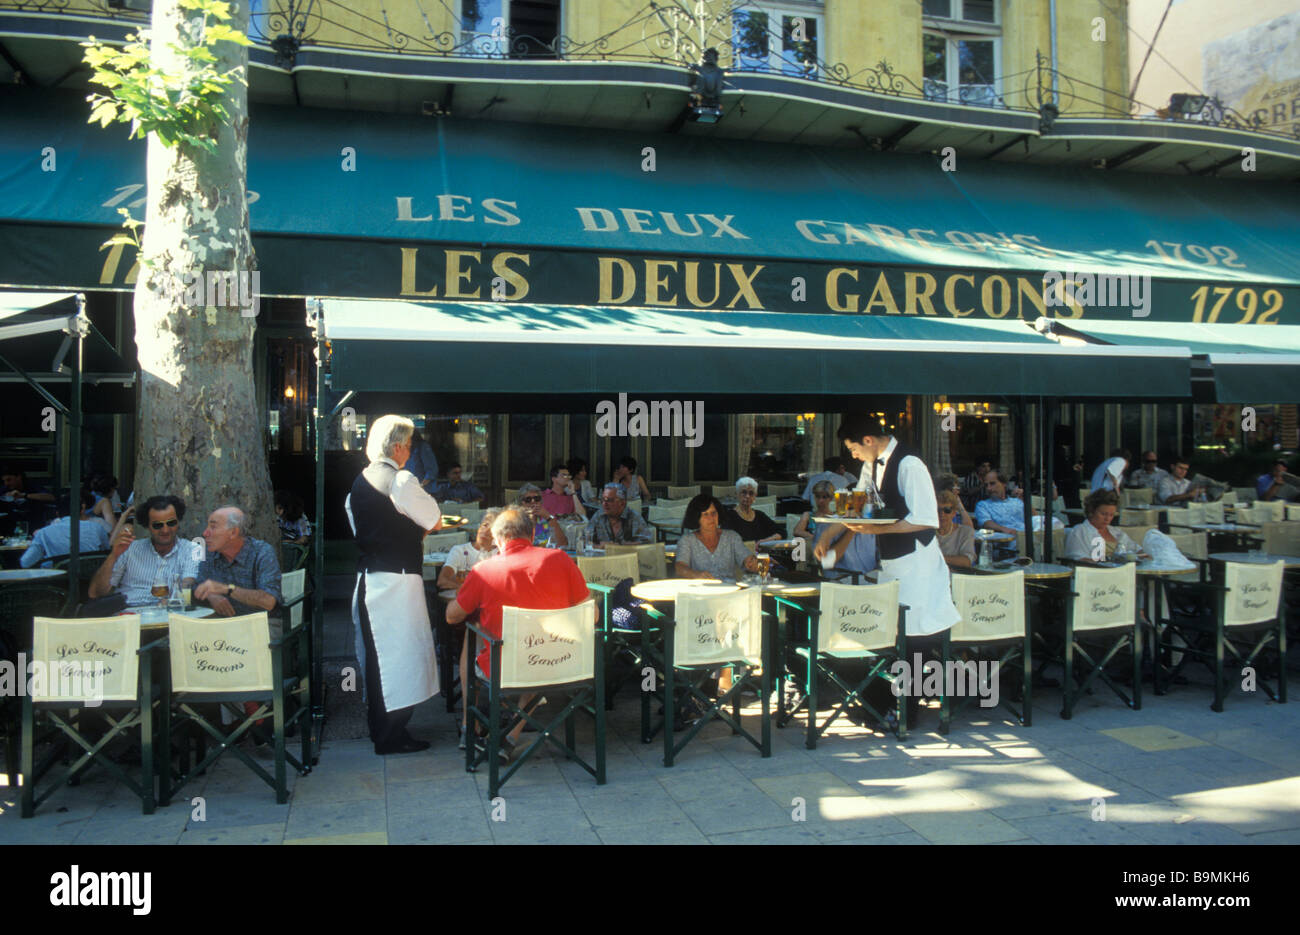 cafe les deux garcons restaurant aix en provence provence france stock photo royalty free. Black Bedroom Furniture Sets. Home Design Ideas